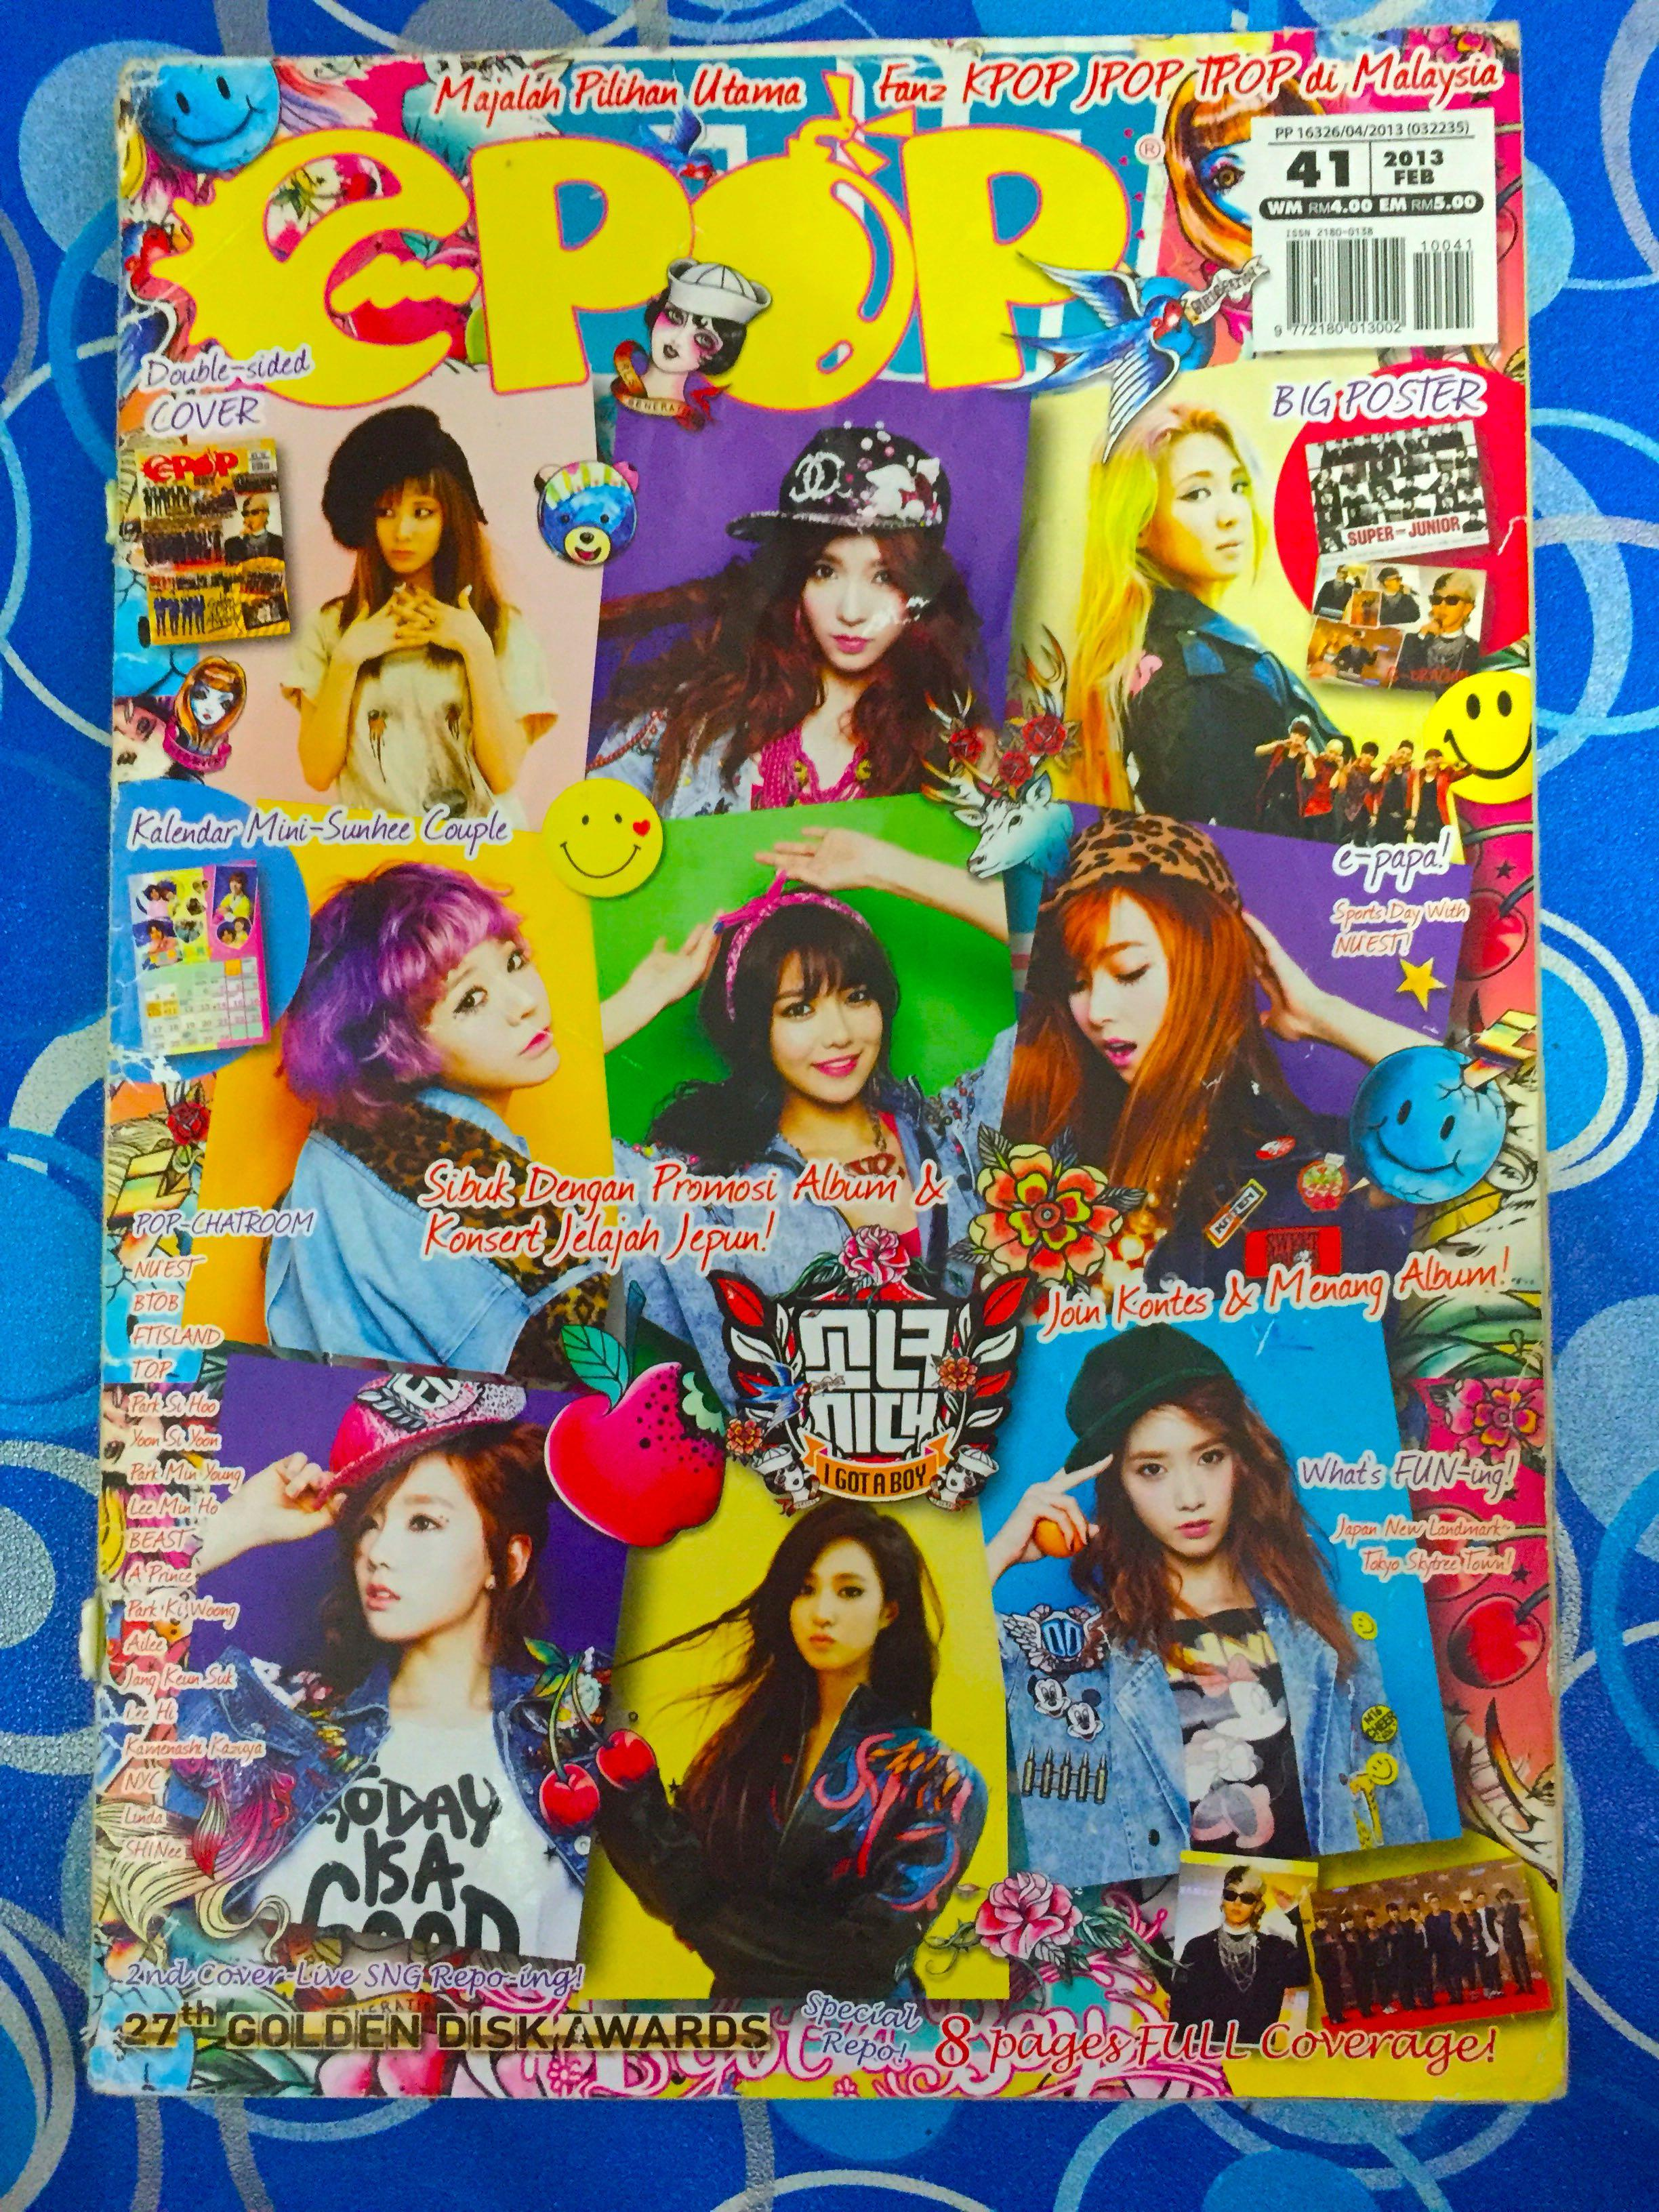 Epop Malay (2013 Jan - Nov Edition (excluding Oct))